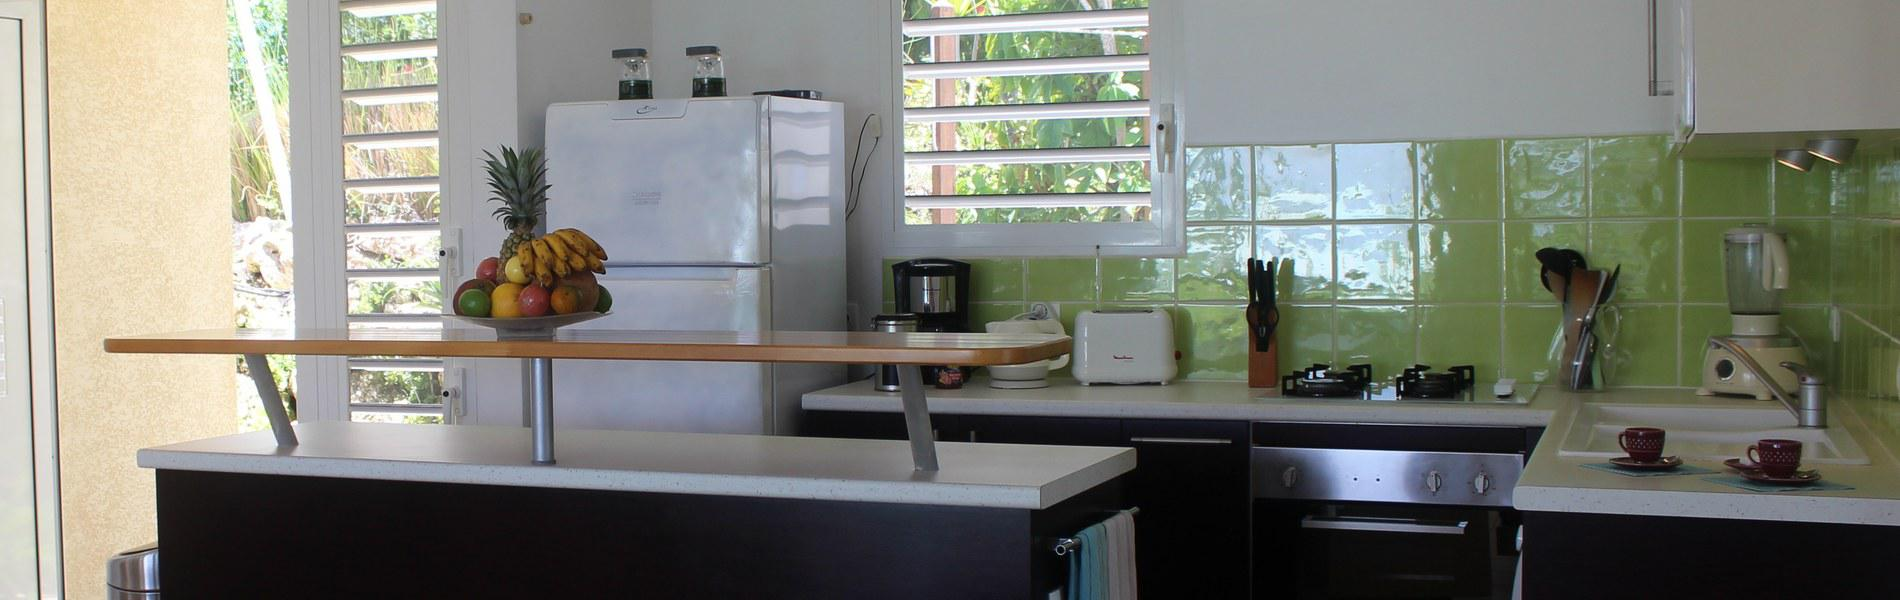 cuisine de la villa iguane house villa avec cuisine. Black Bedroom Furniture Sets. Home Design Ideas